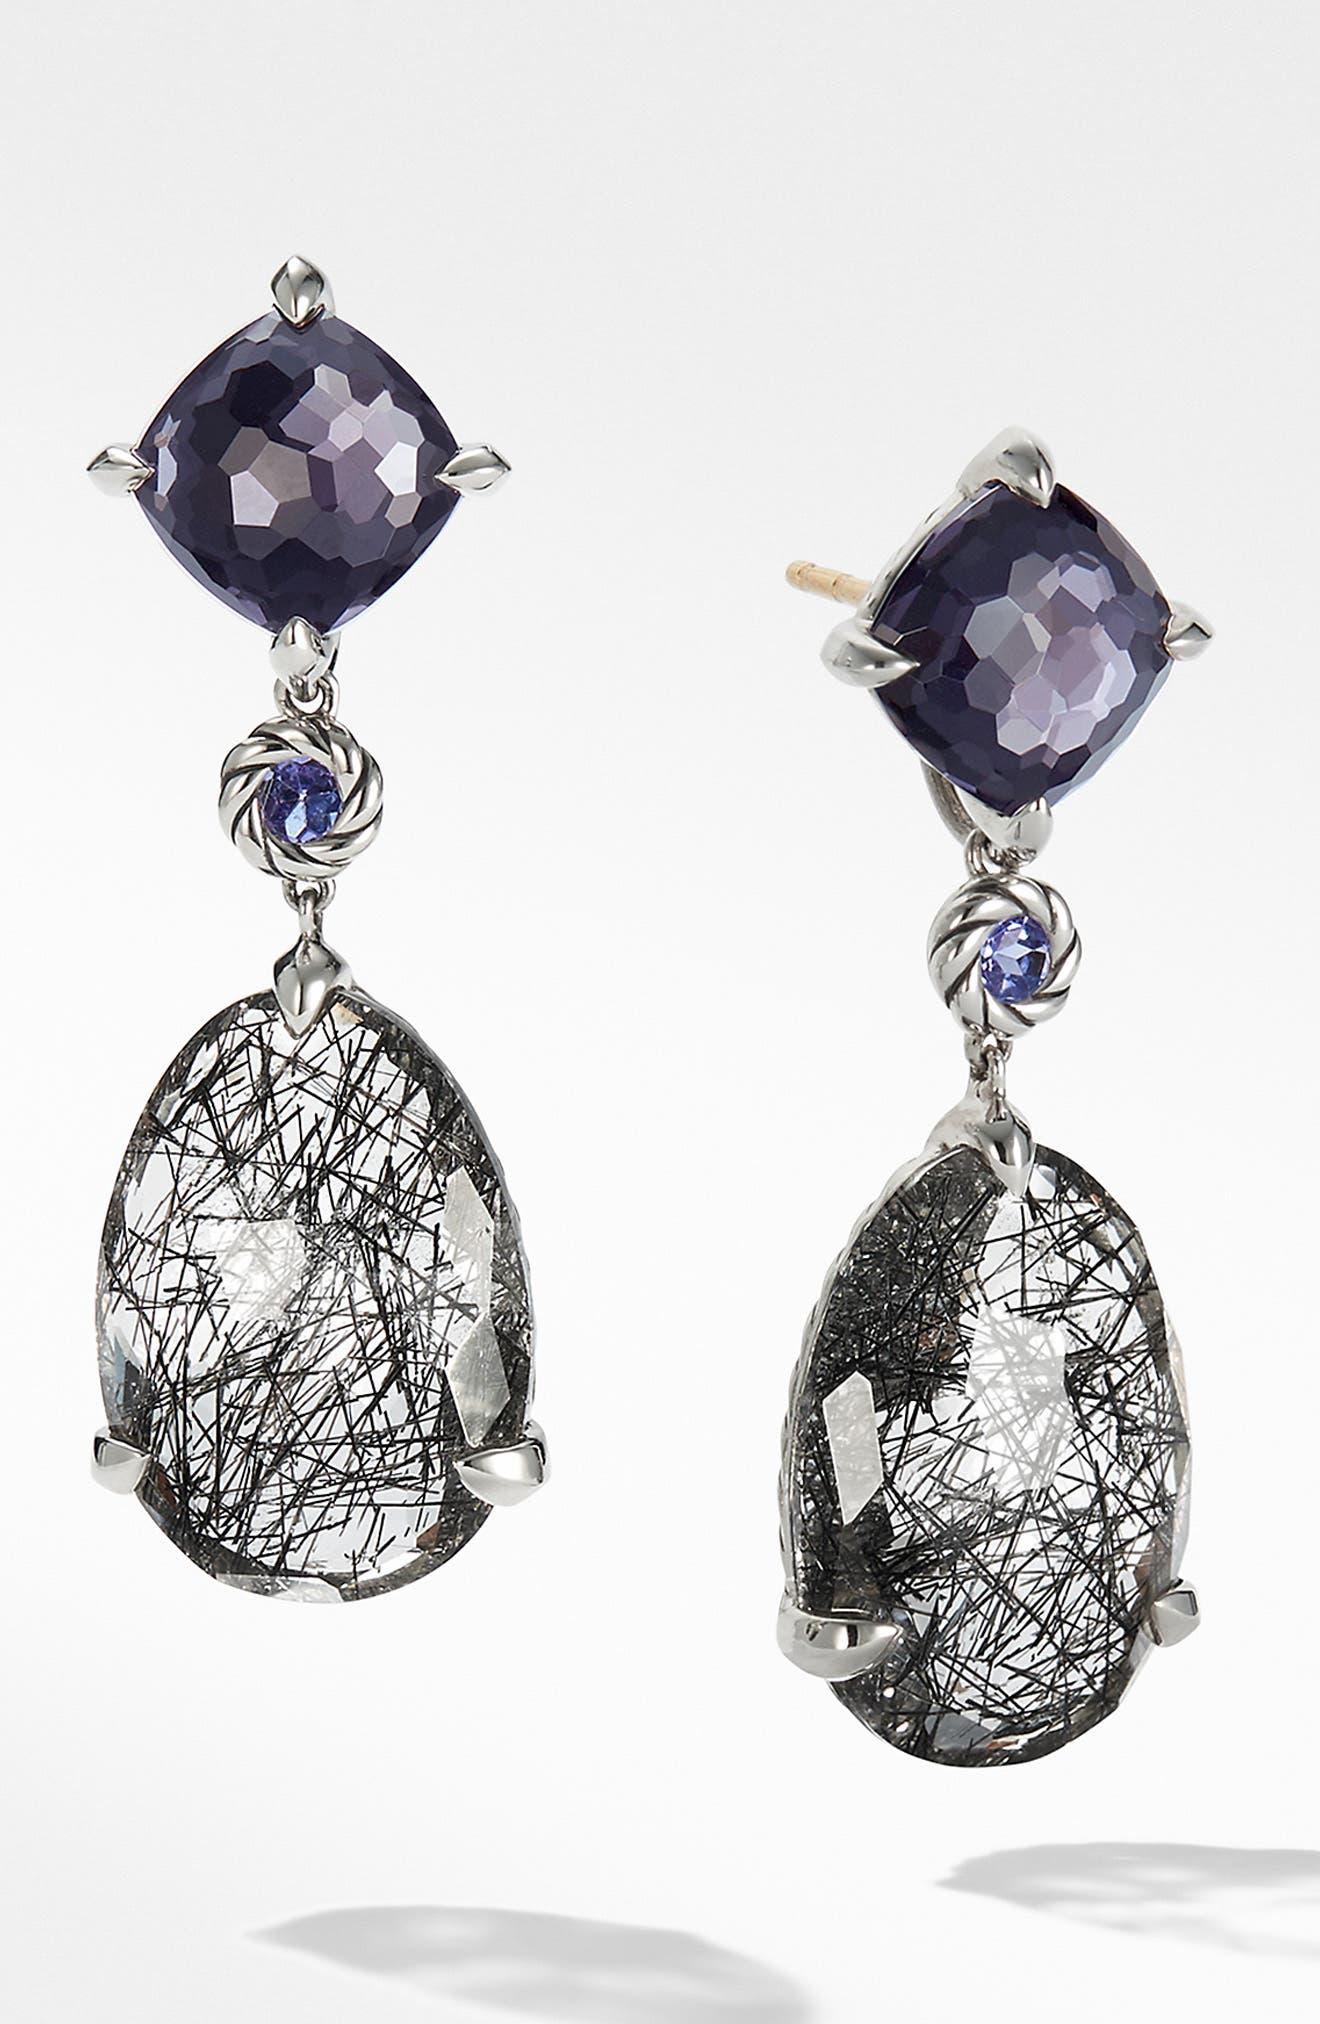 DAVID YURMAN Chatelaine Drop Earrings, Main, color, TOURMILATED QUARTZ